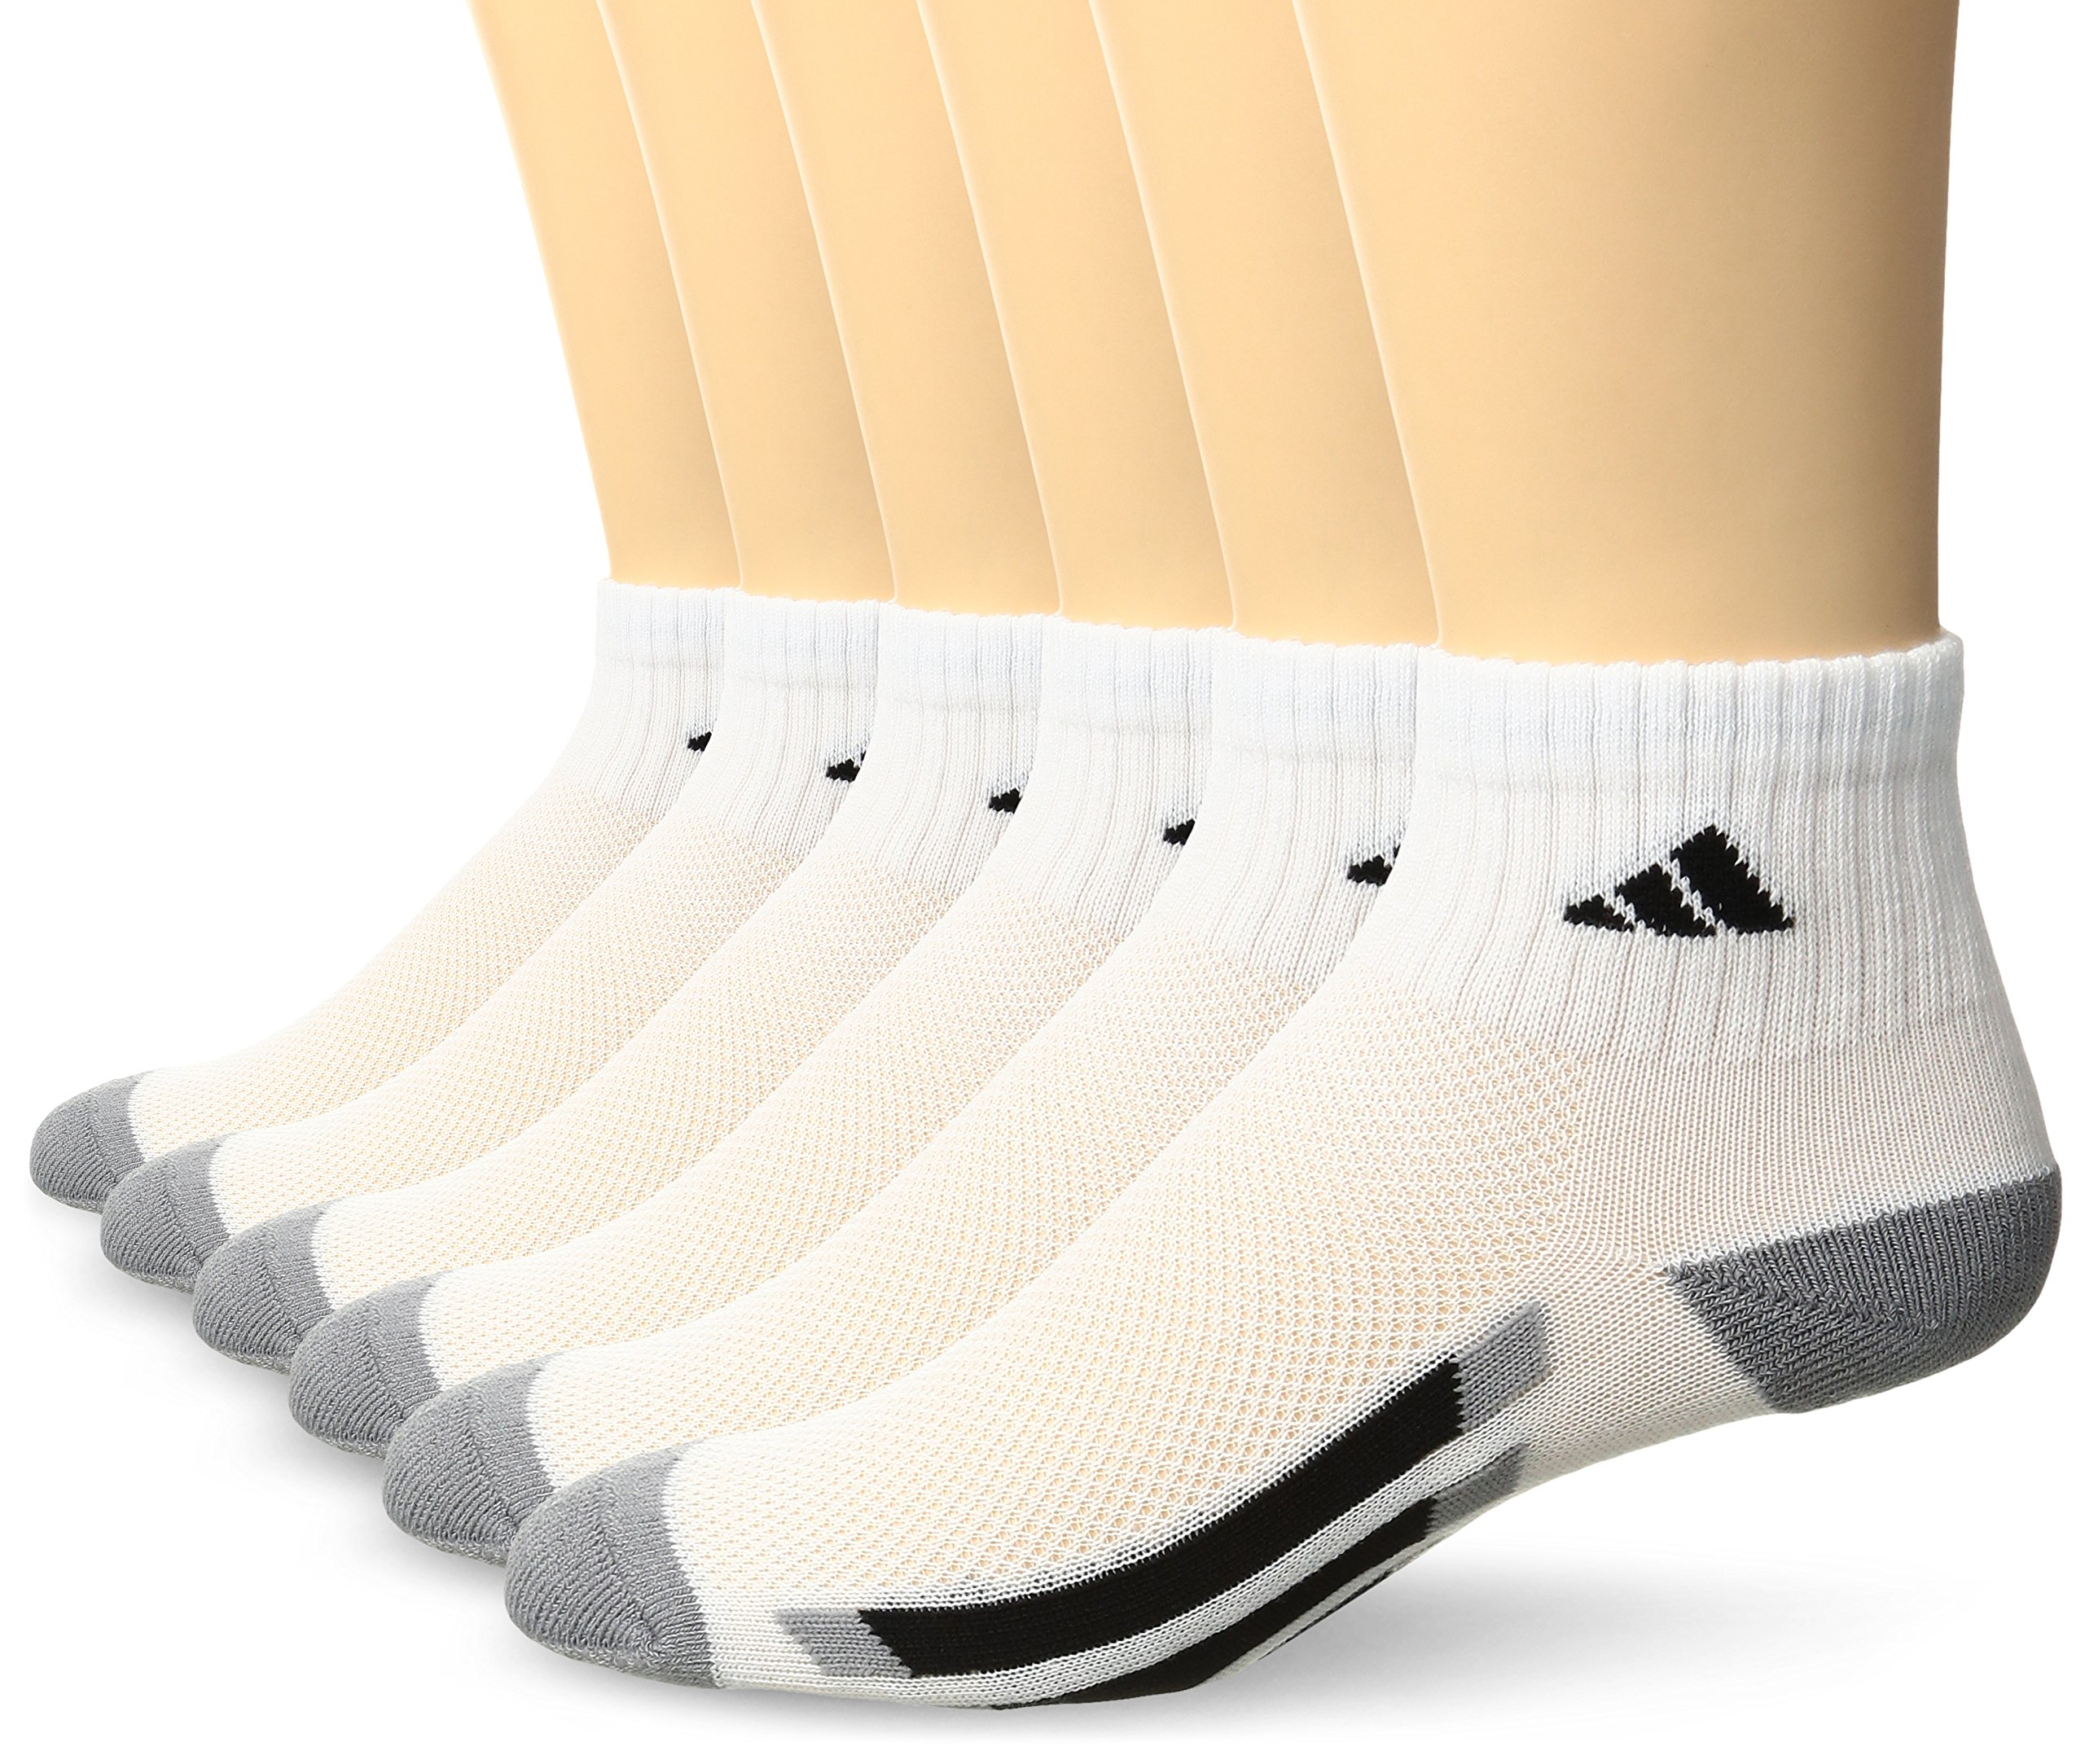 adidas Youth Kids-Boy's/Girl's Cushioned Quarter Socks (6-Pair), White/Black/Light Onix, Medium, (Shoe Size 13C-4Y) by adidas